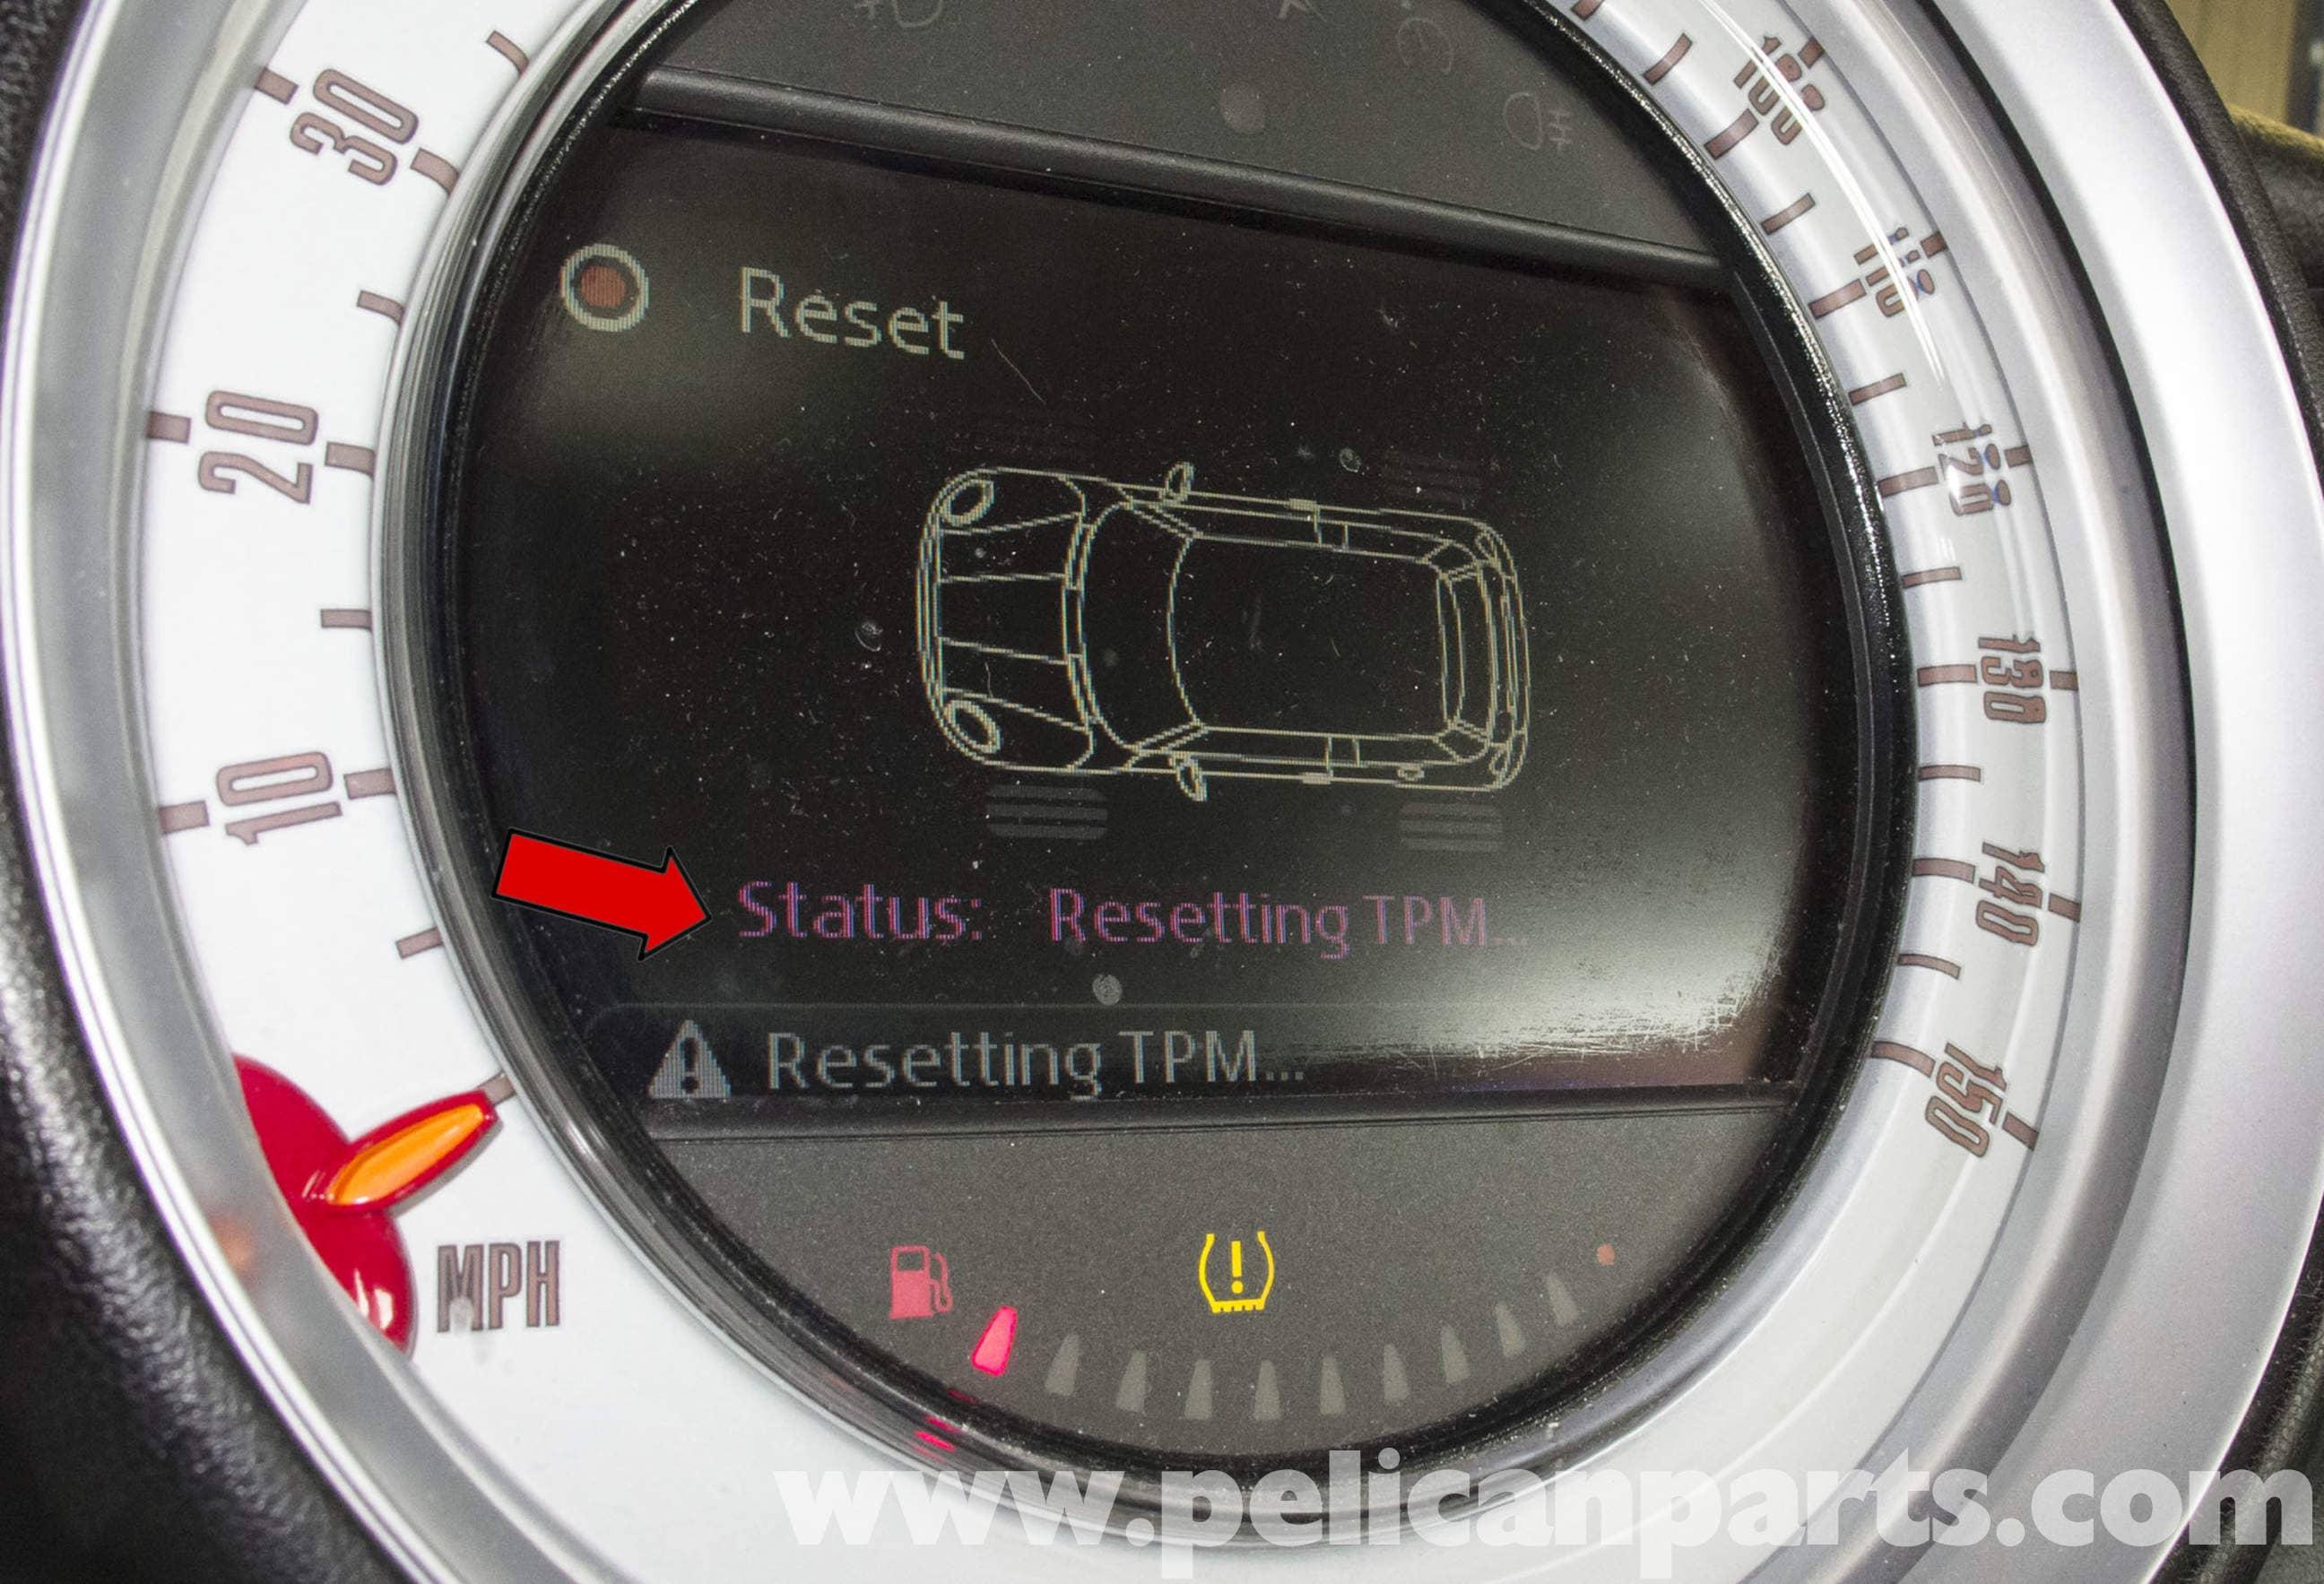 Tire Pressure Sensor Fault >> MINI Cooper R56 Tire Pressure Monitoring (2007-2011) | Pelican Parts DIY Maintenance Article